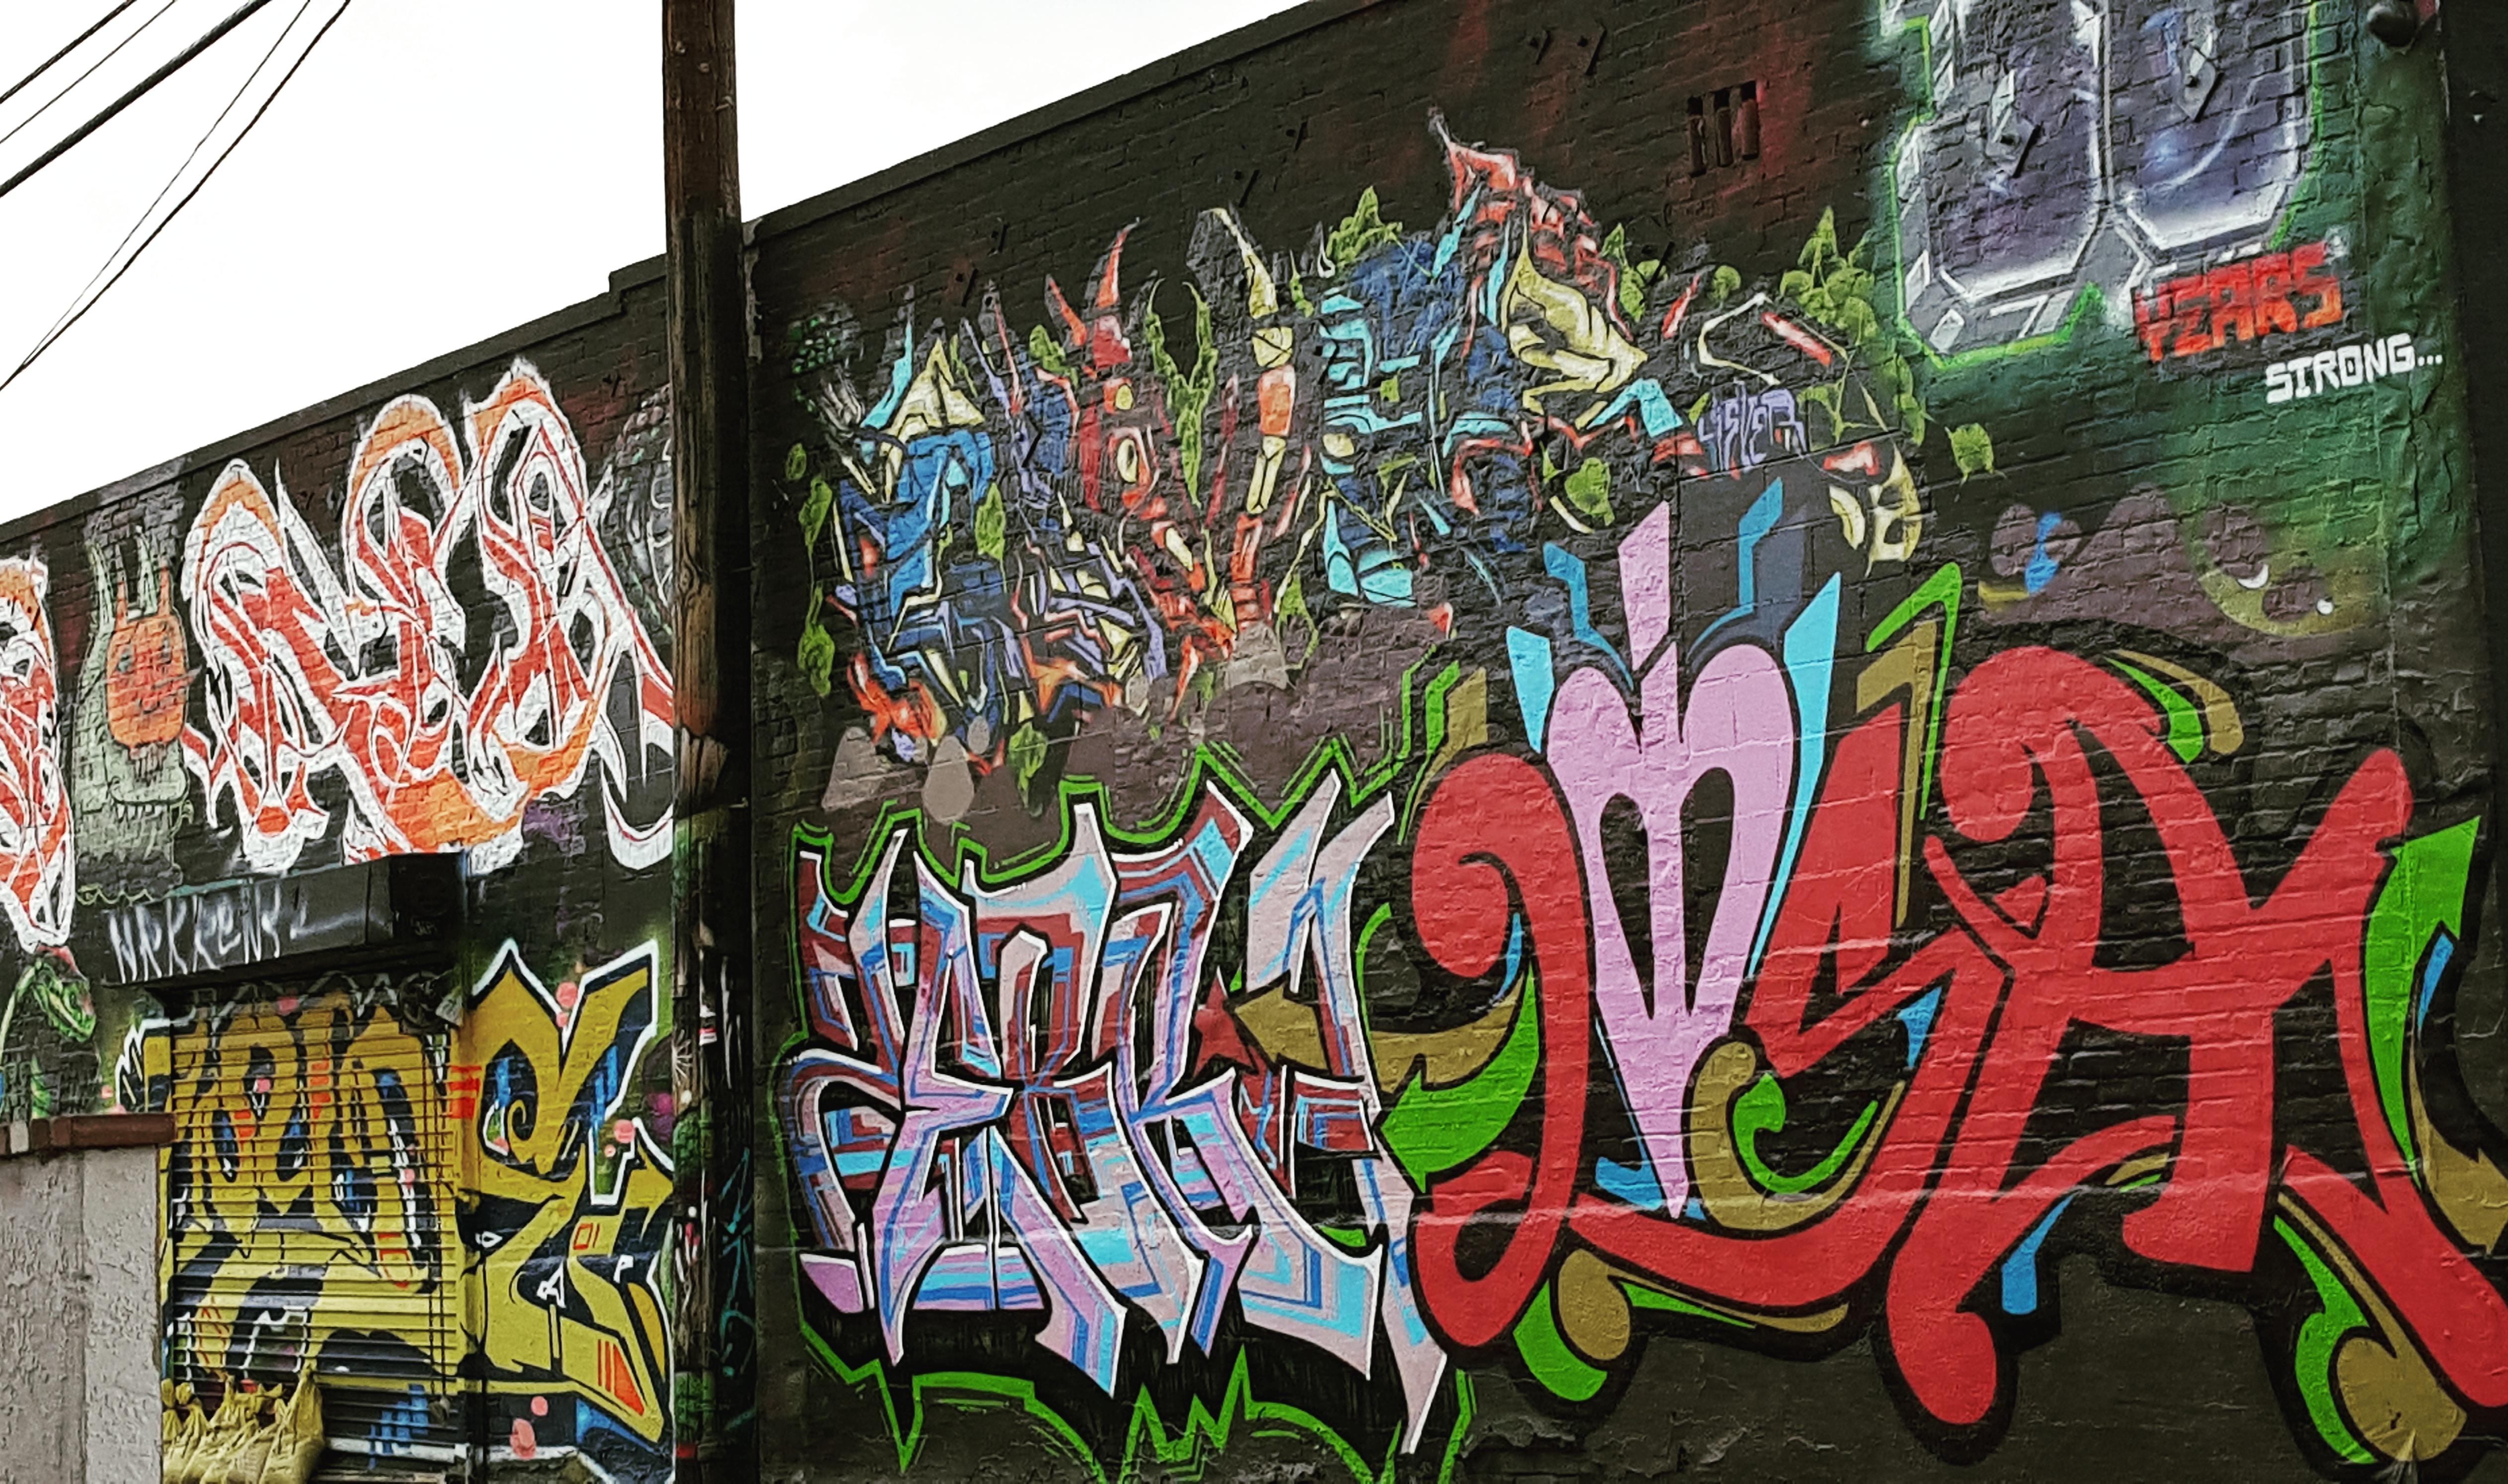 graffiti is art essay 91 121 113 106 graffiti is art essay